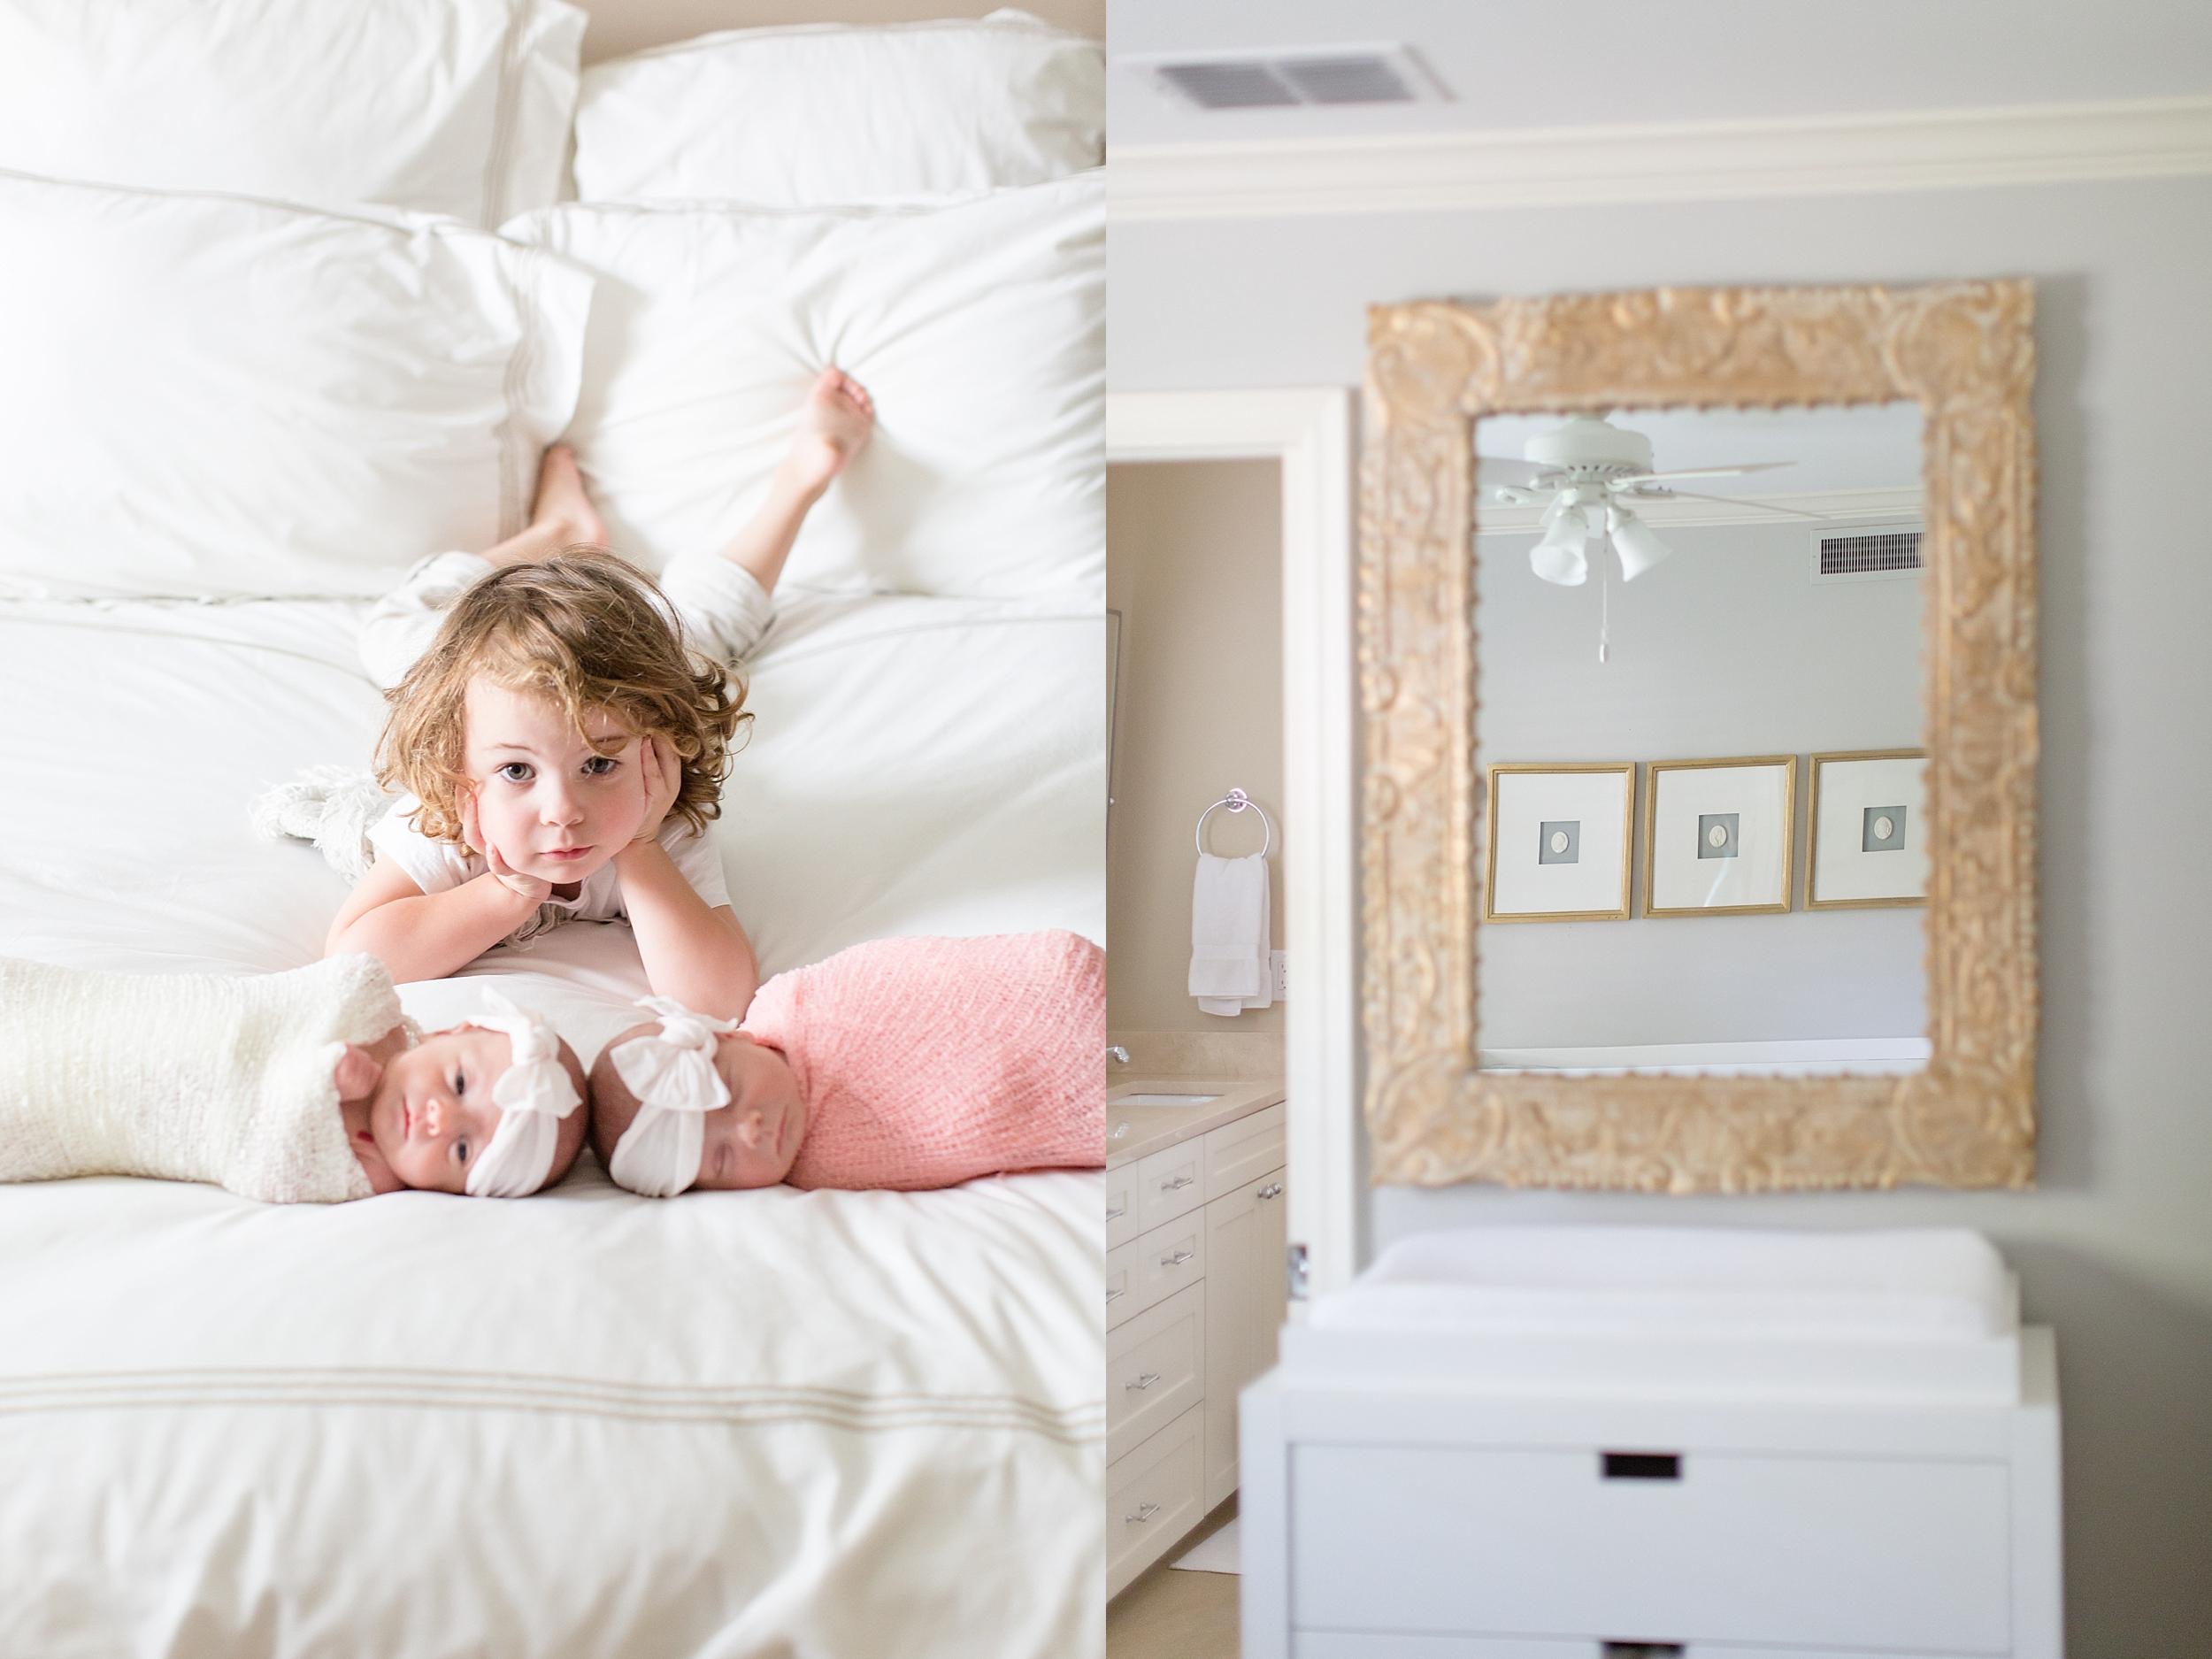 Landon-Schneider-Photography-Holt-Newborn-Session-Texas_0019.jpg